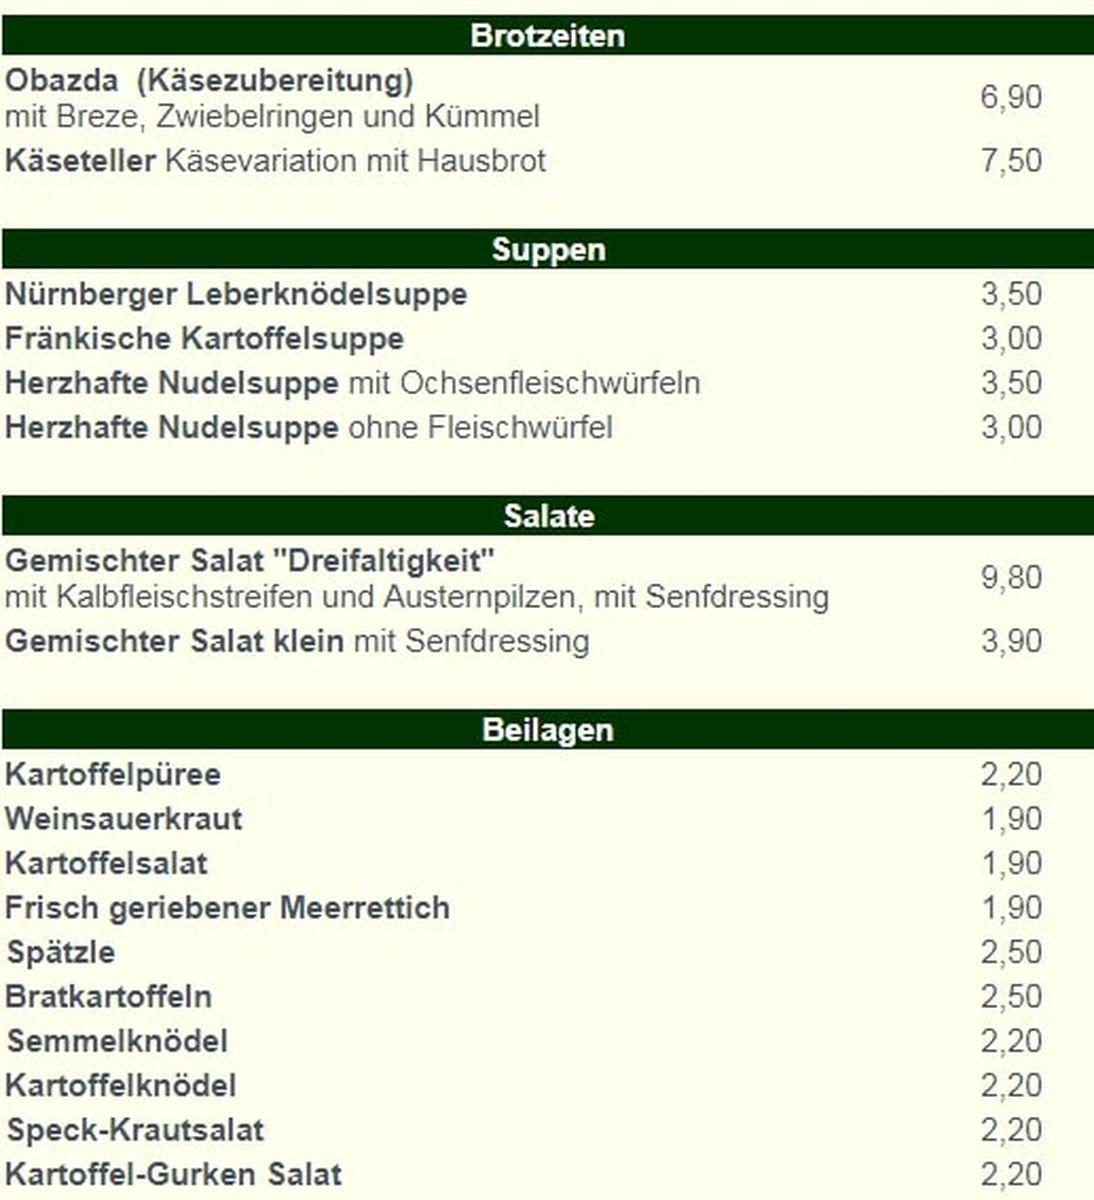 Меню кафе Bratwurstherzl